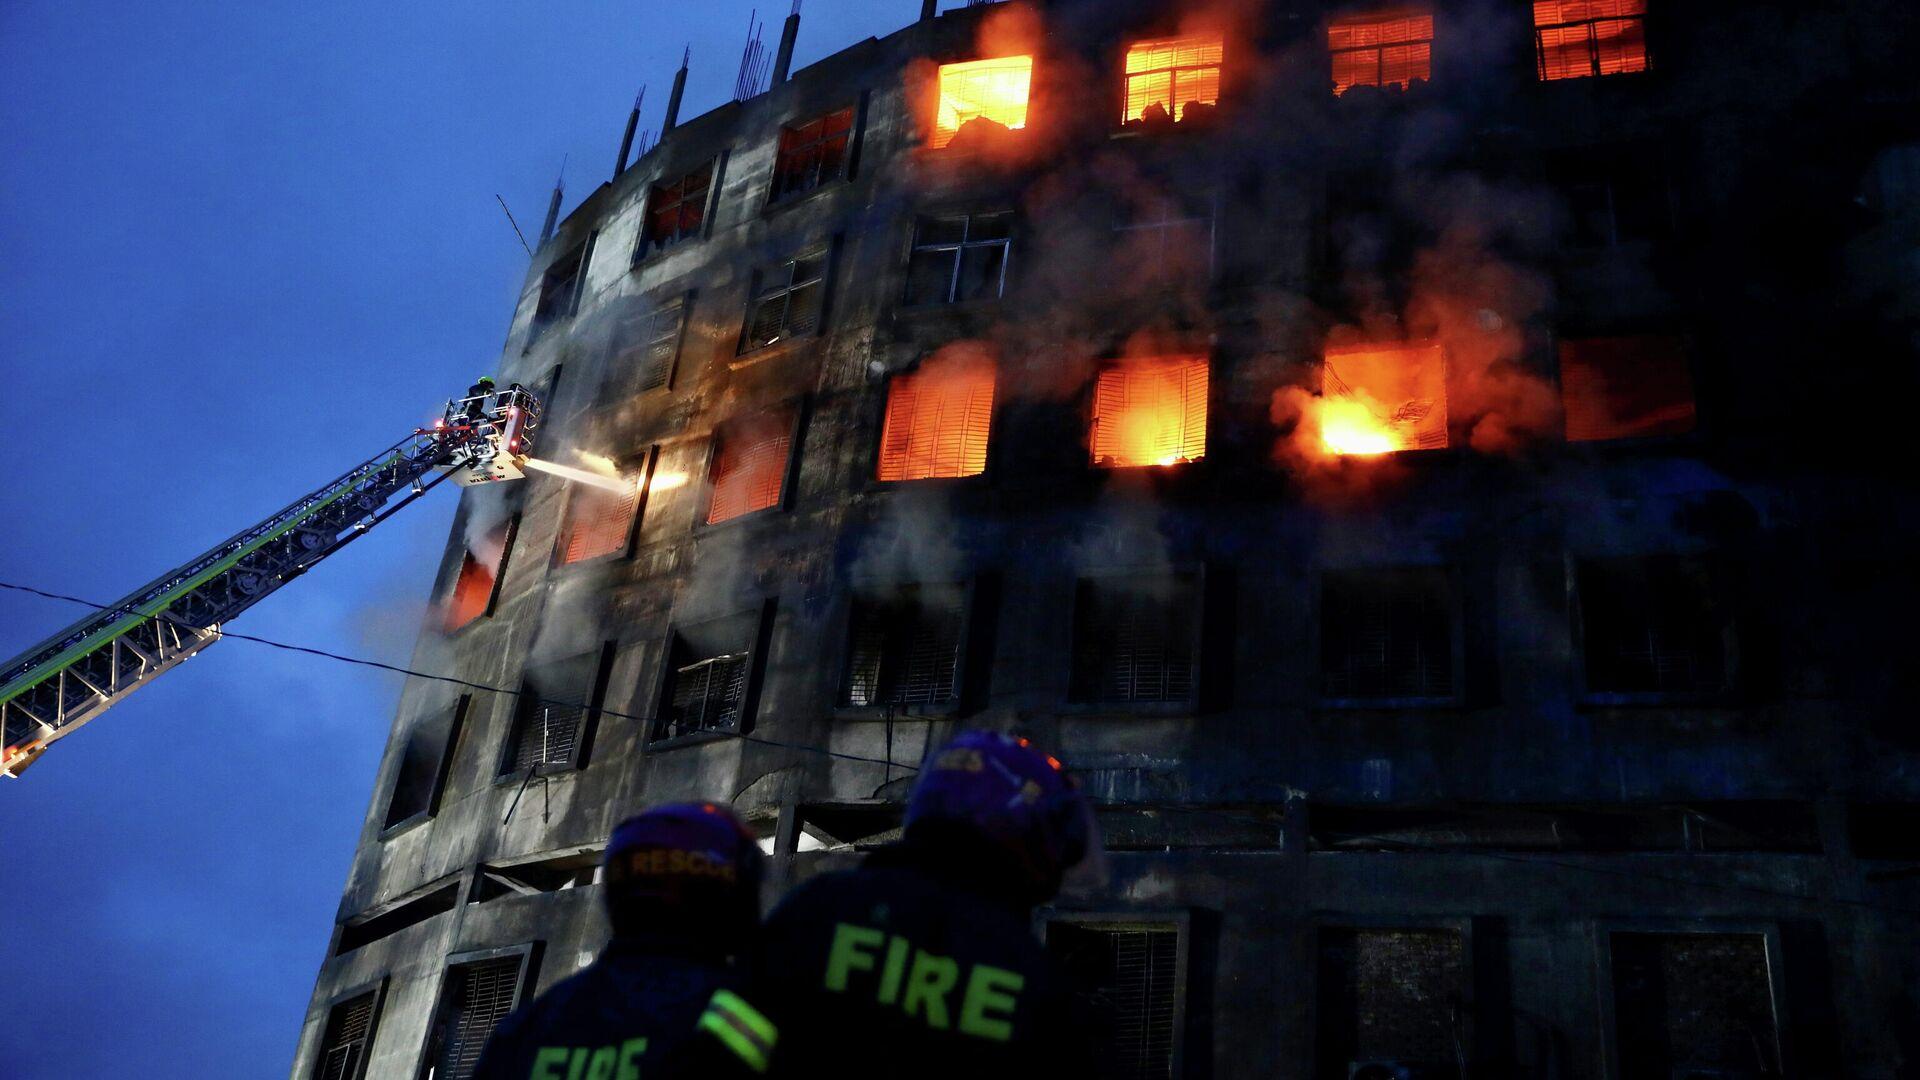 Un incendio en una fábrica de Bangladés - Sputnik Mundo, 1920, 09.07.2021